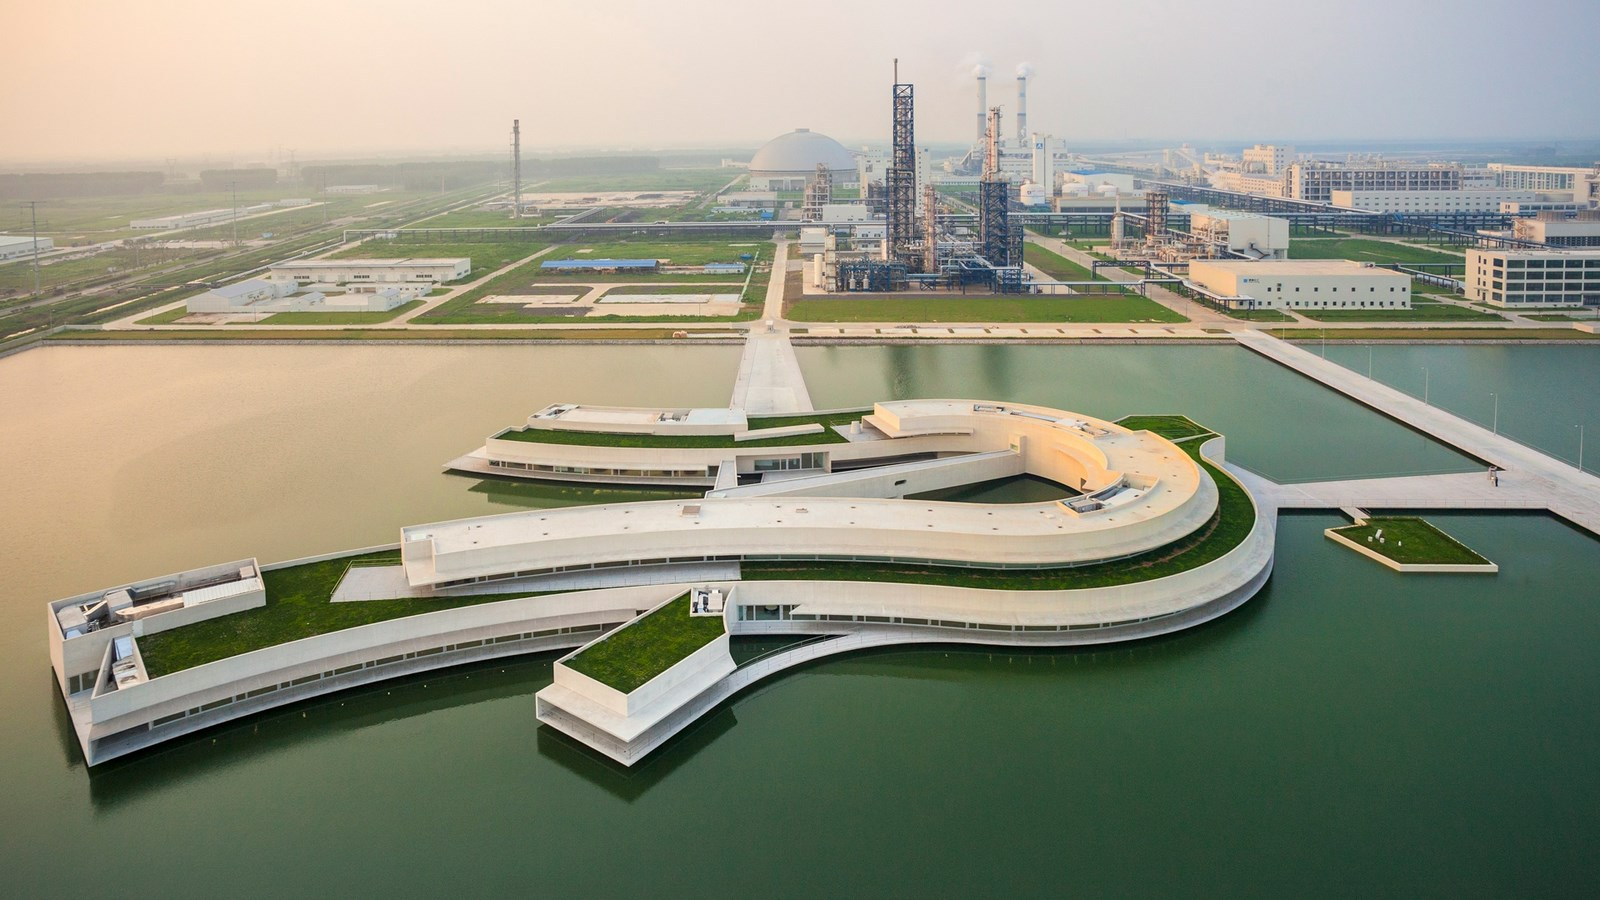 Alvaro Siza- Leca Building on the Water - Sheet5